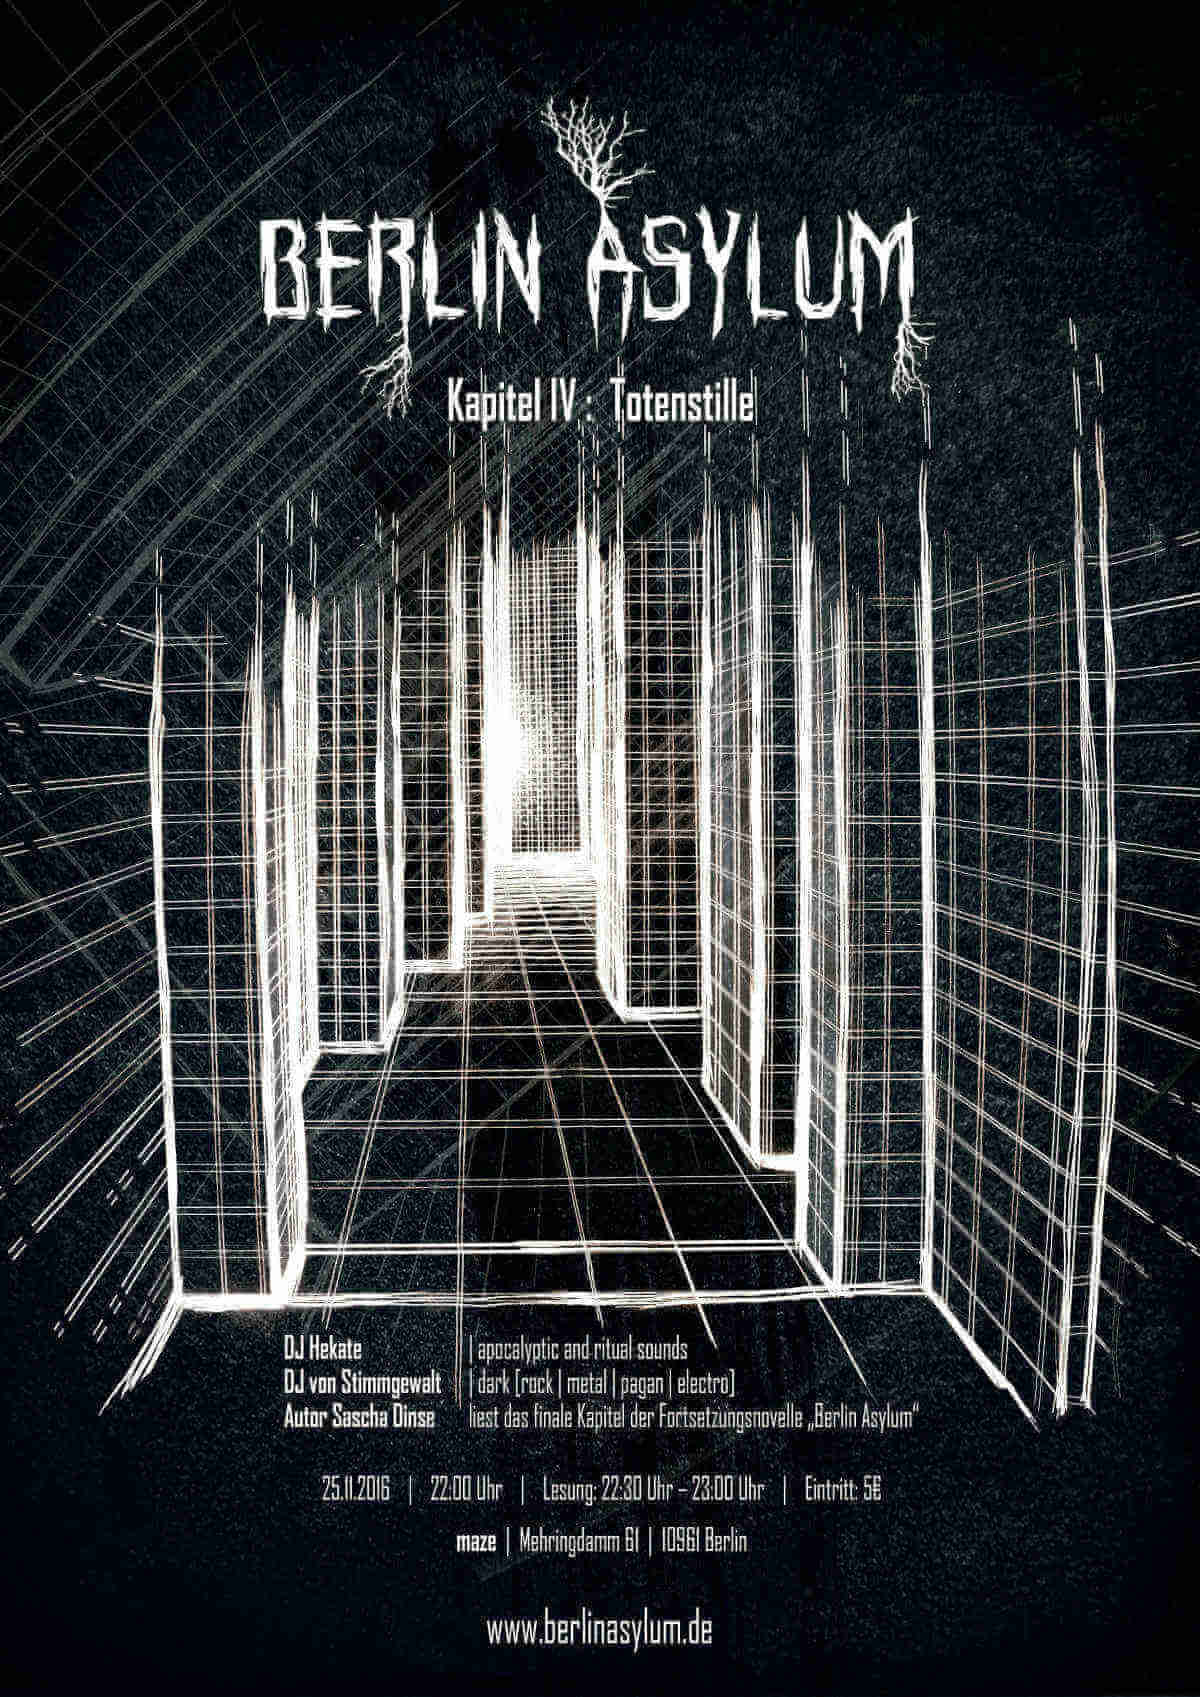 Poster Berlin Asylum Totenstille